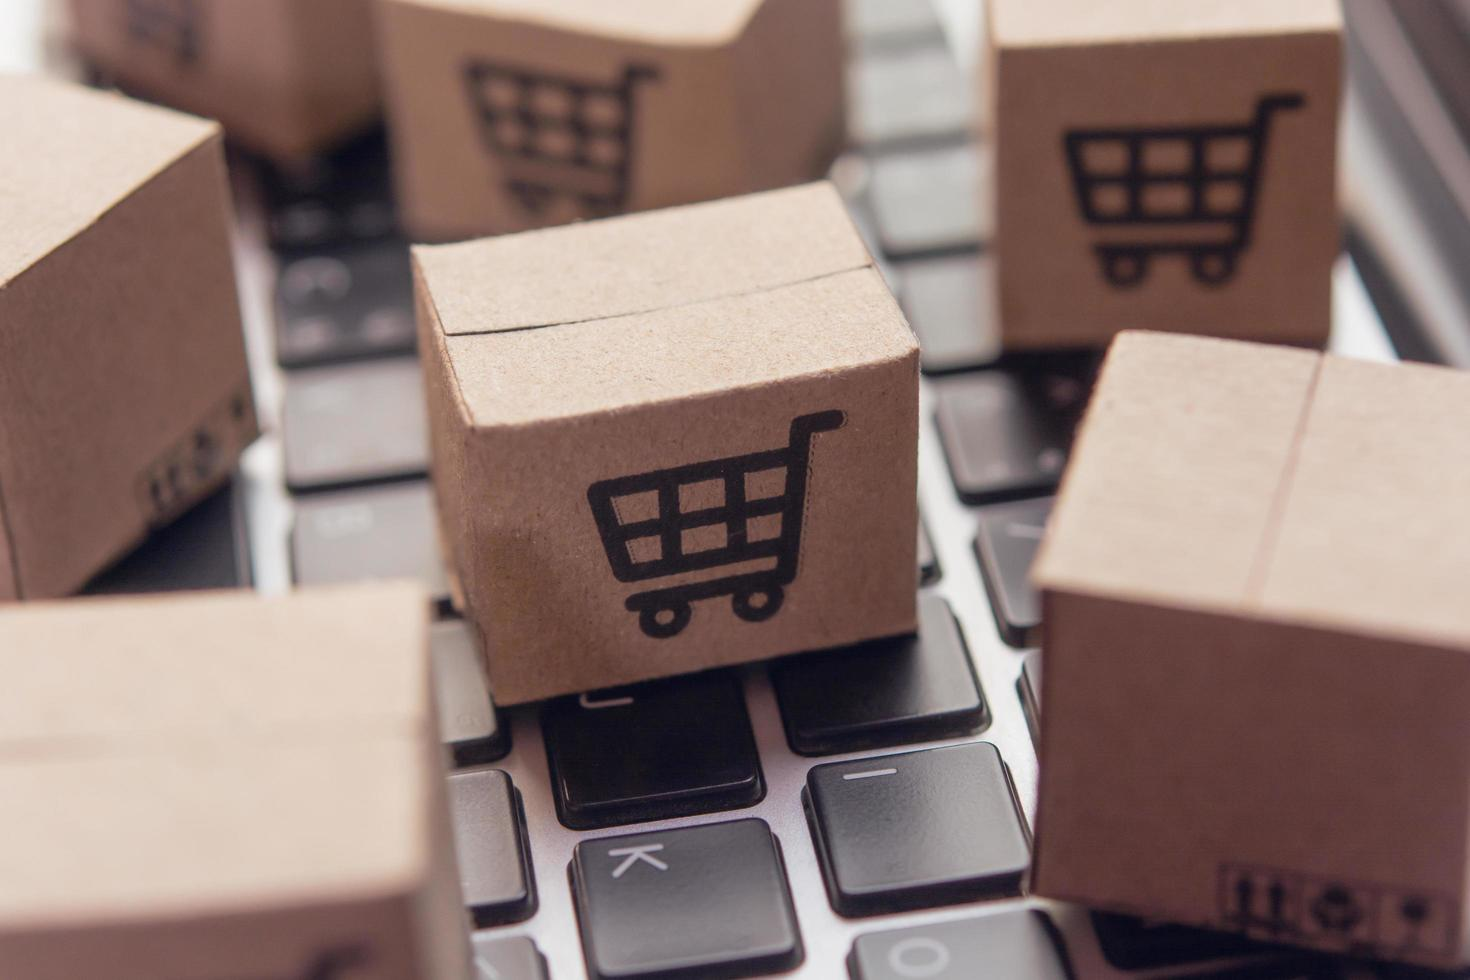 Miniature shipping boxes on keaybord photo